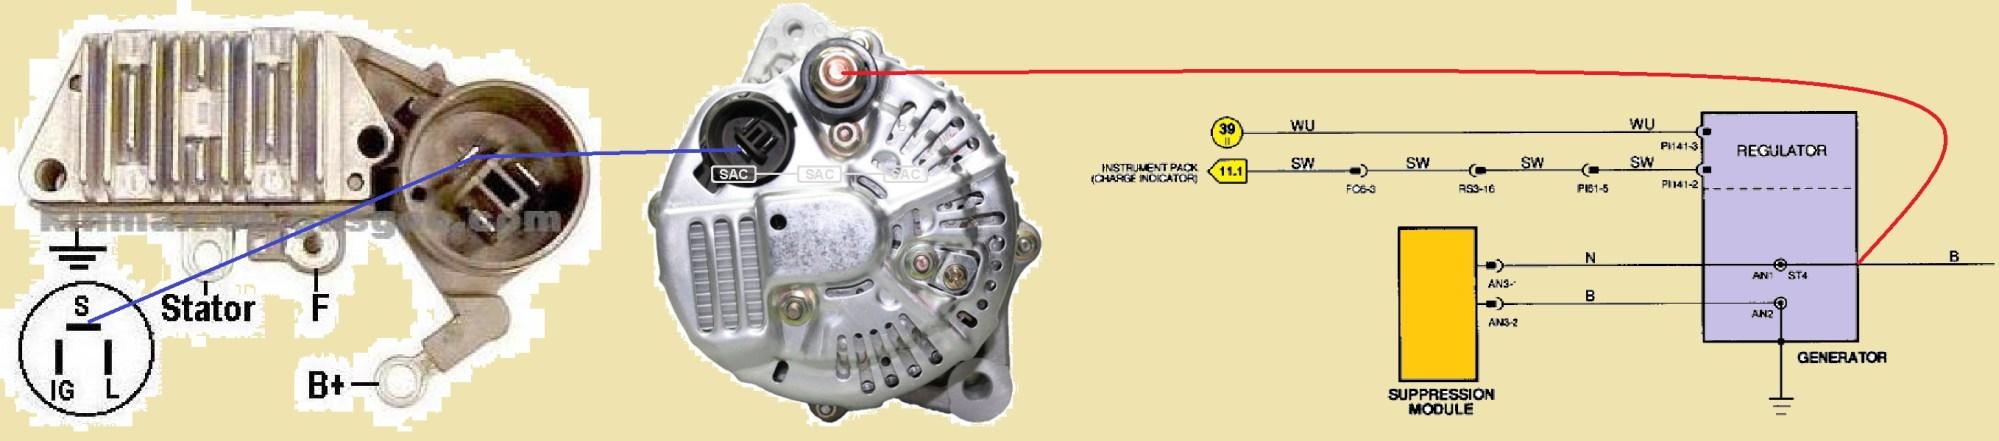 hight resolution of jaguar b wiring